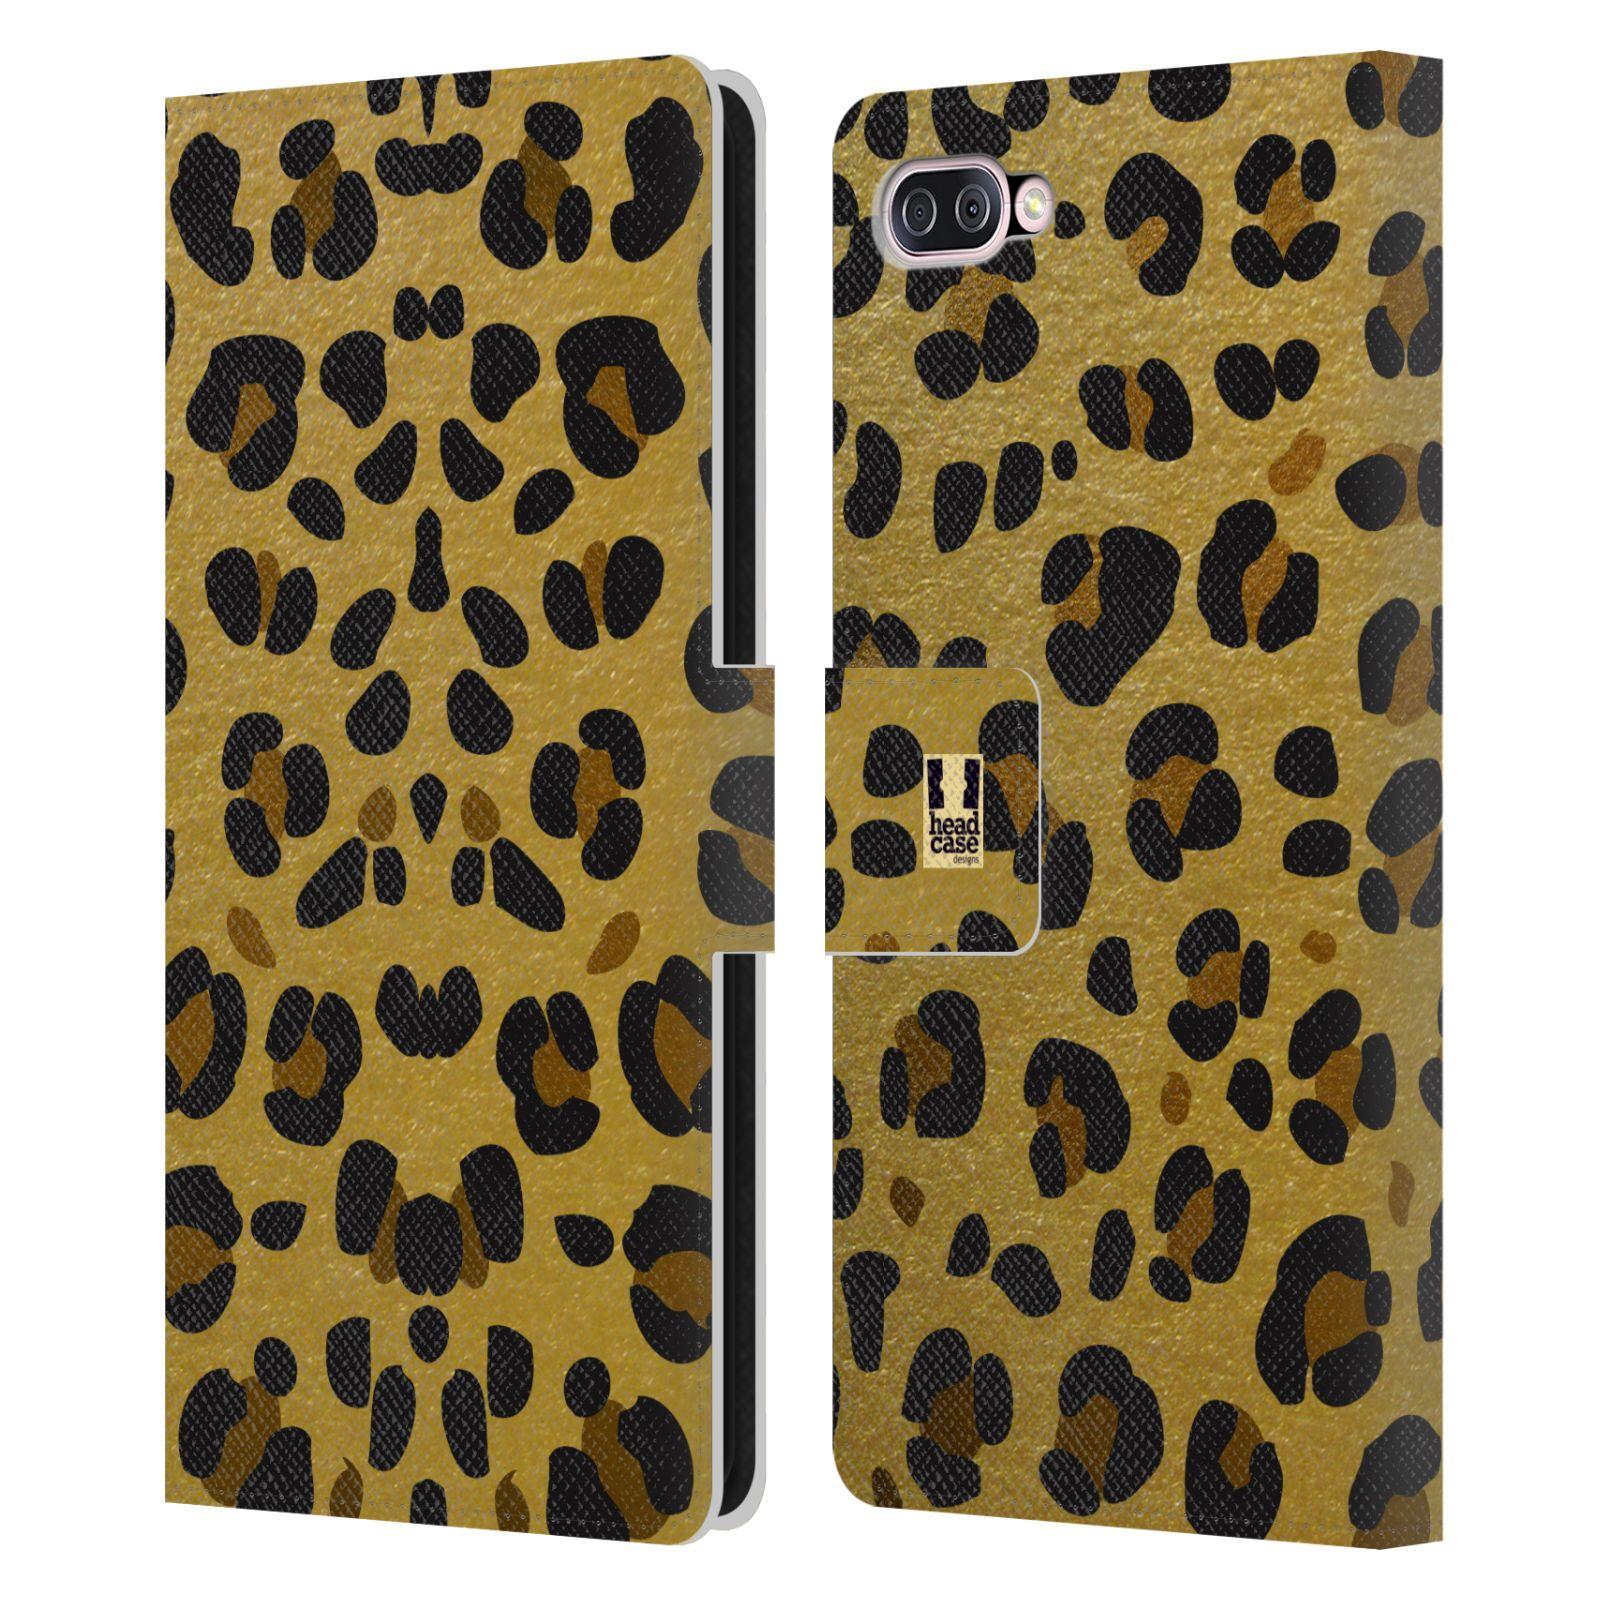 Pouzdro na mobil Asus Zenfone 4 Max ZC554KL - Head Case - Fashion zvířecí vzor